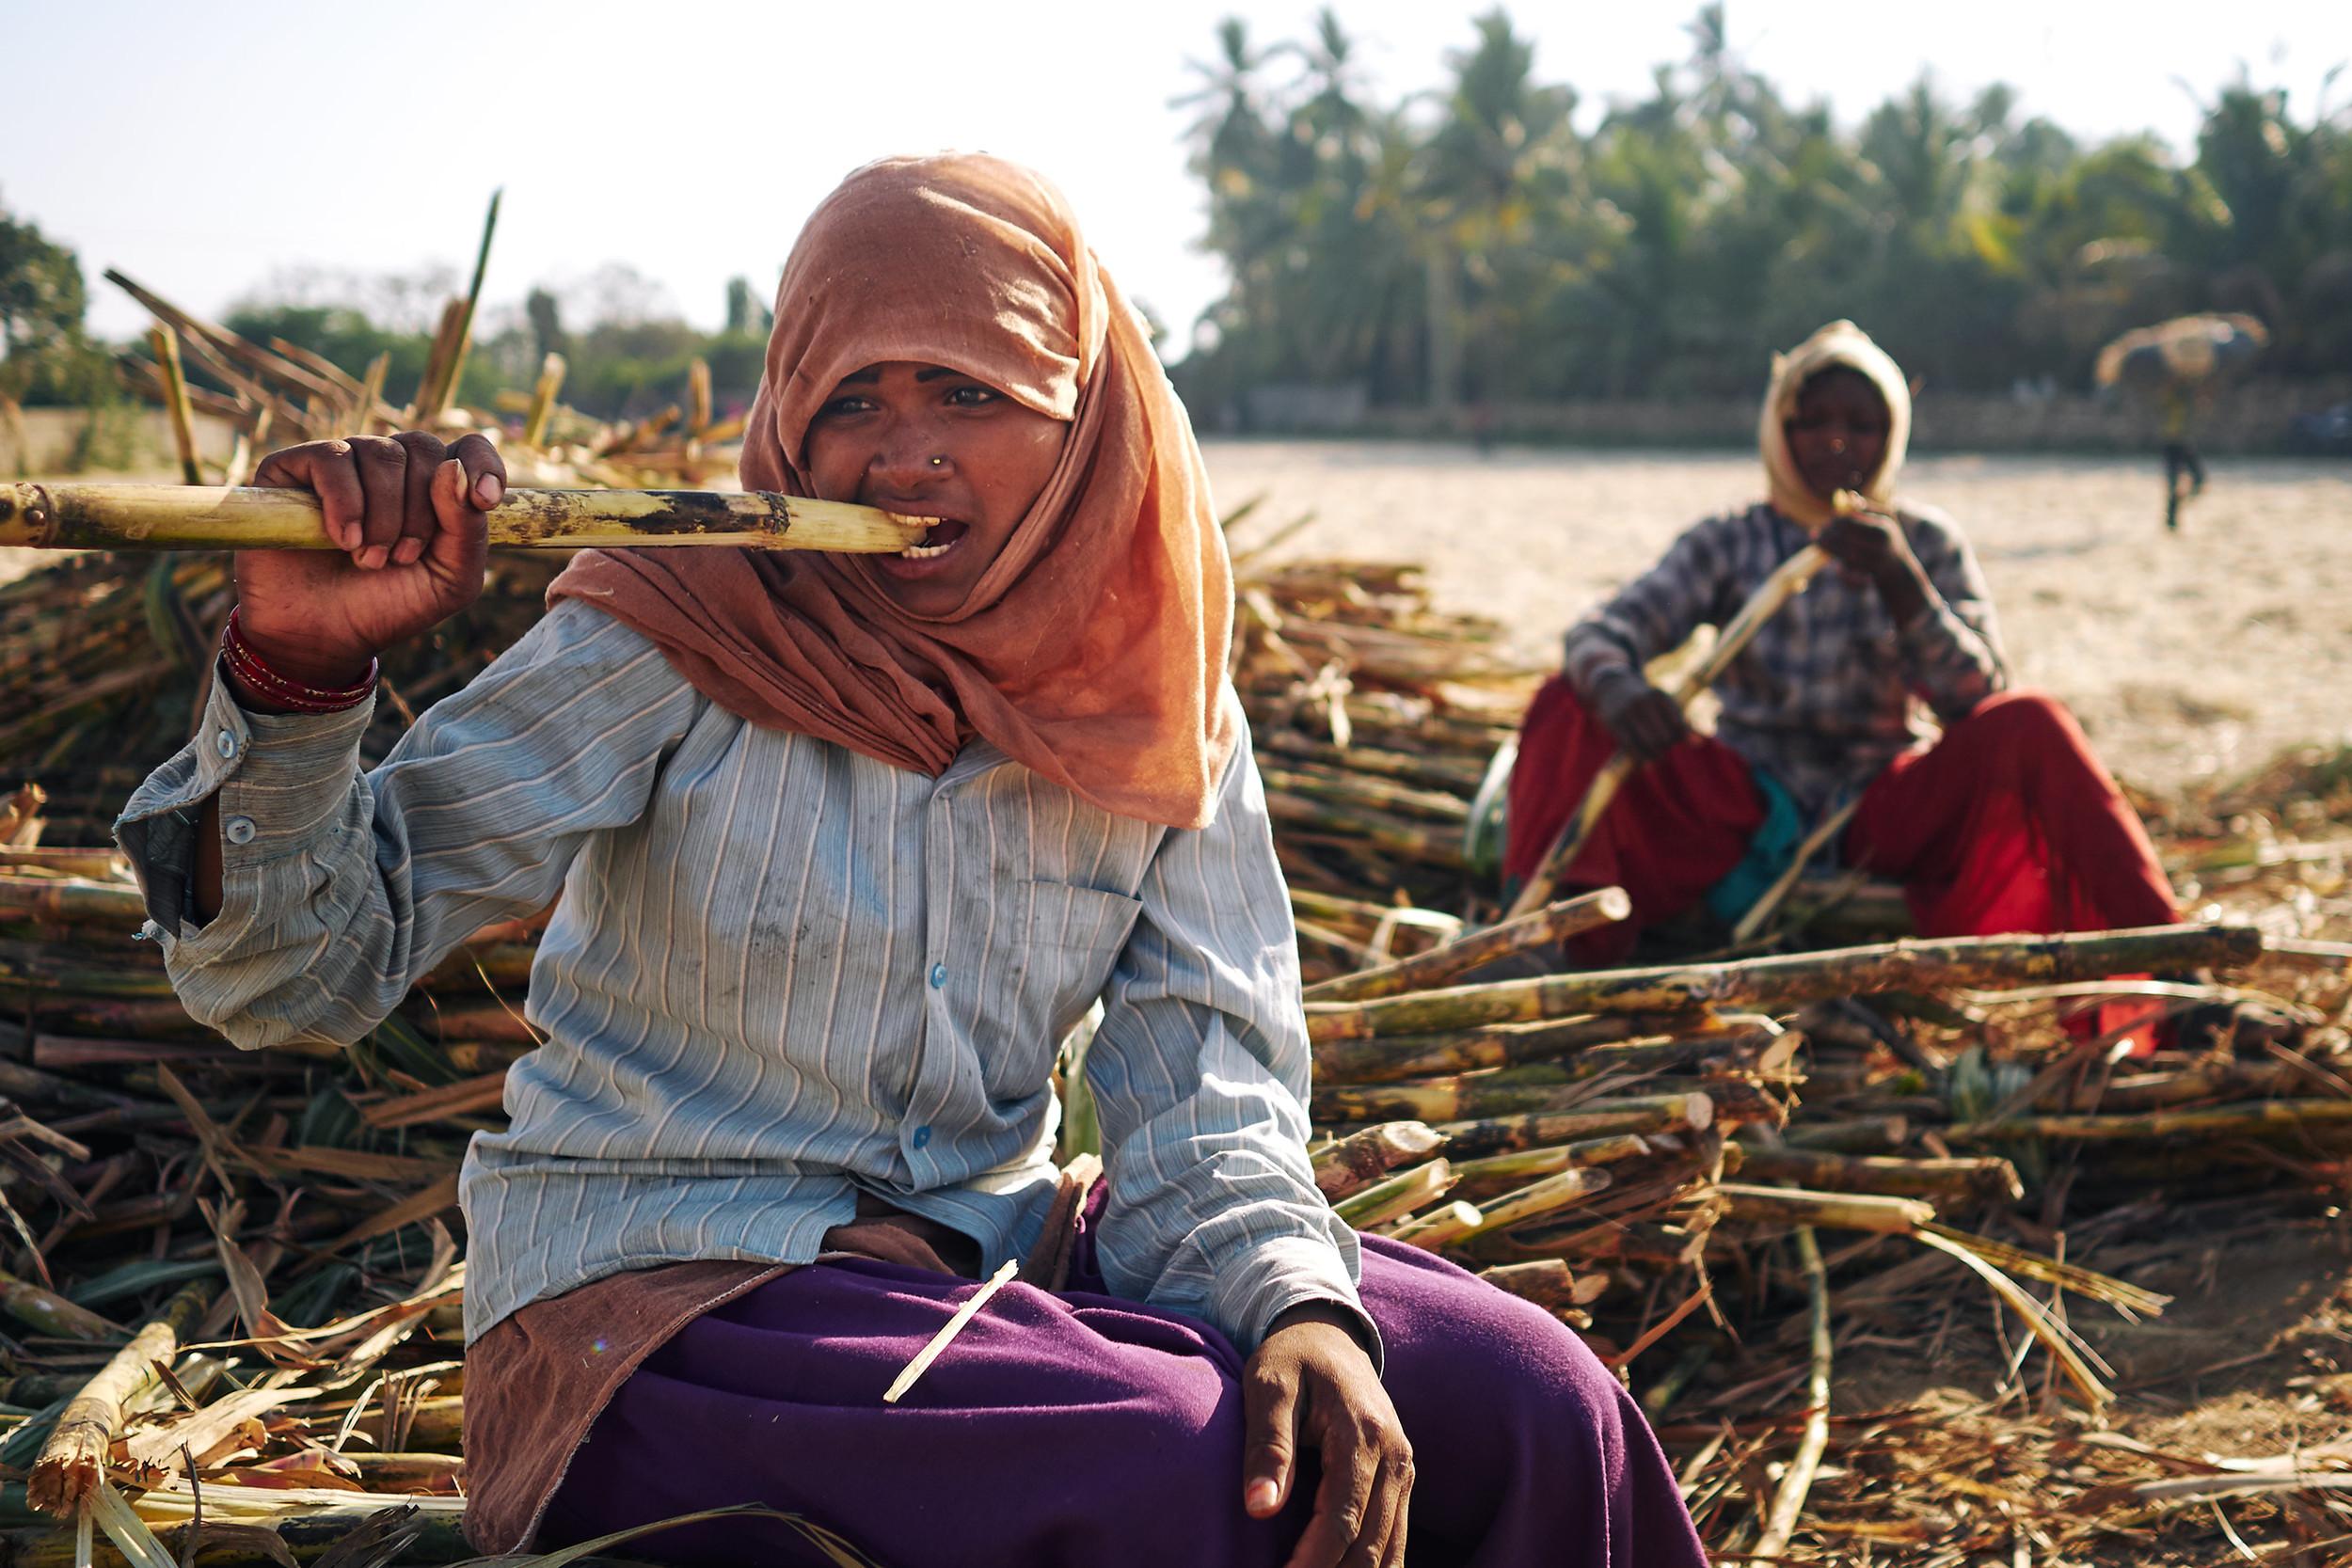 Sugarcane workers eating sugarcane during a break